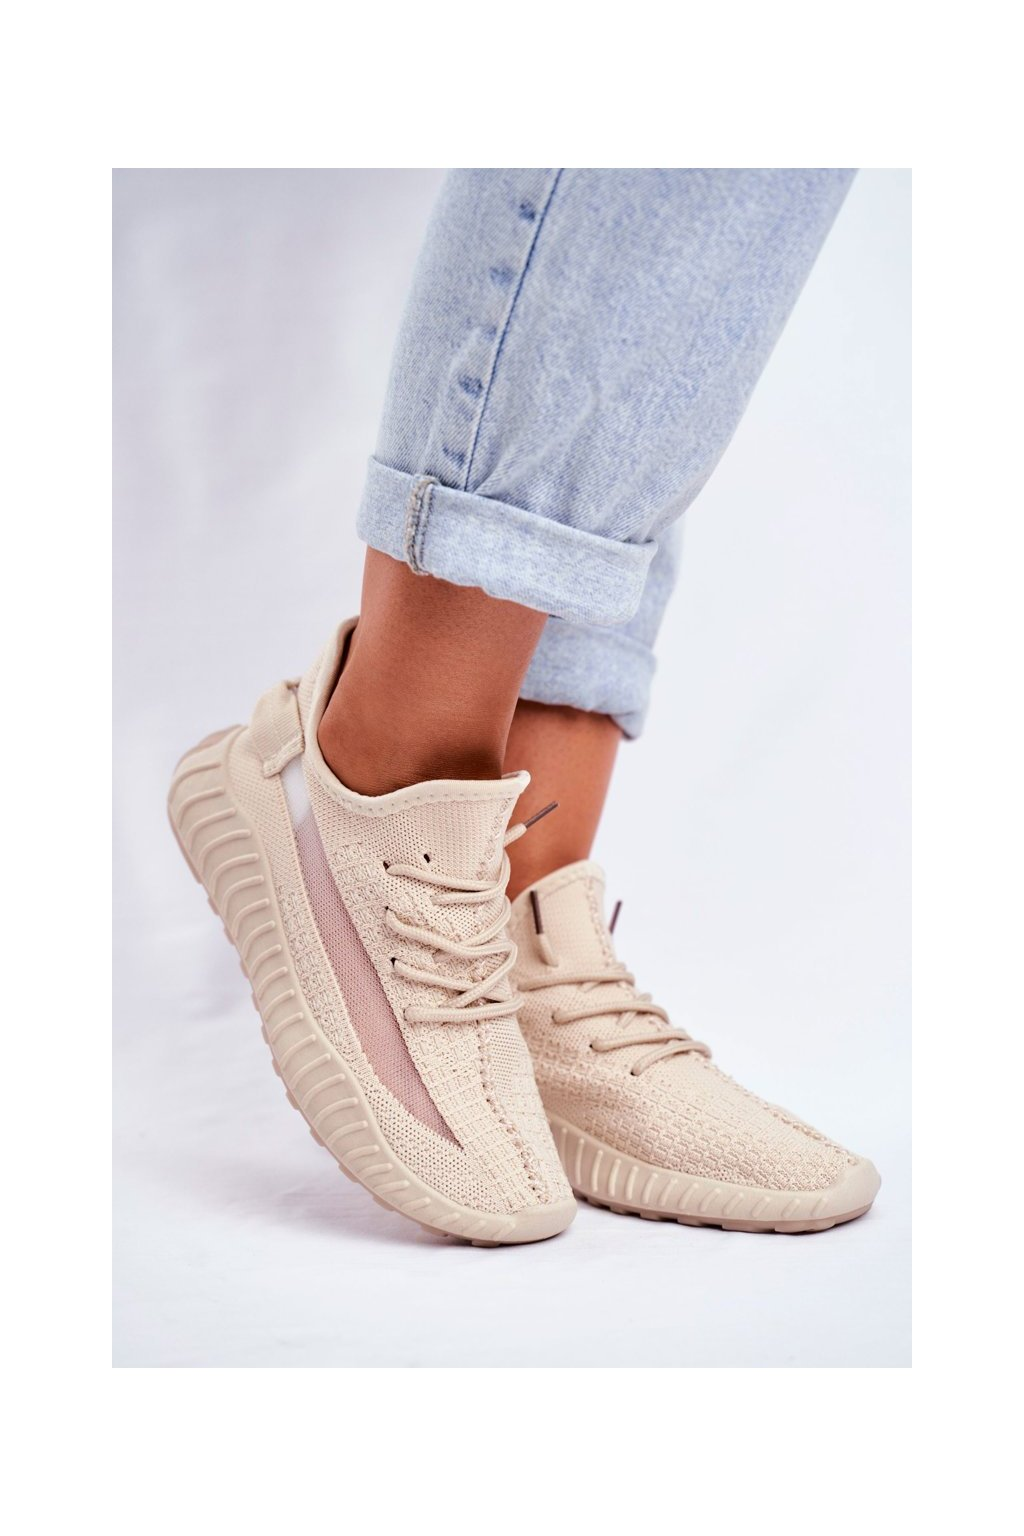 Hnedá obuv kód topánok LA90 BEIGE